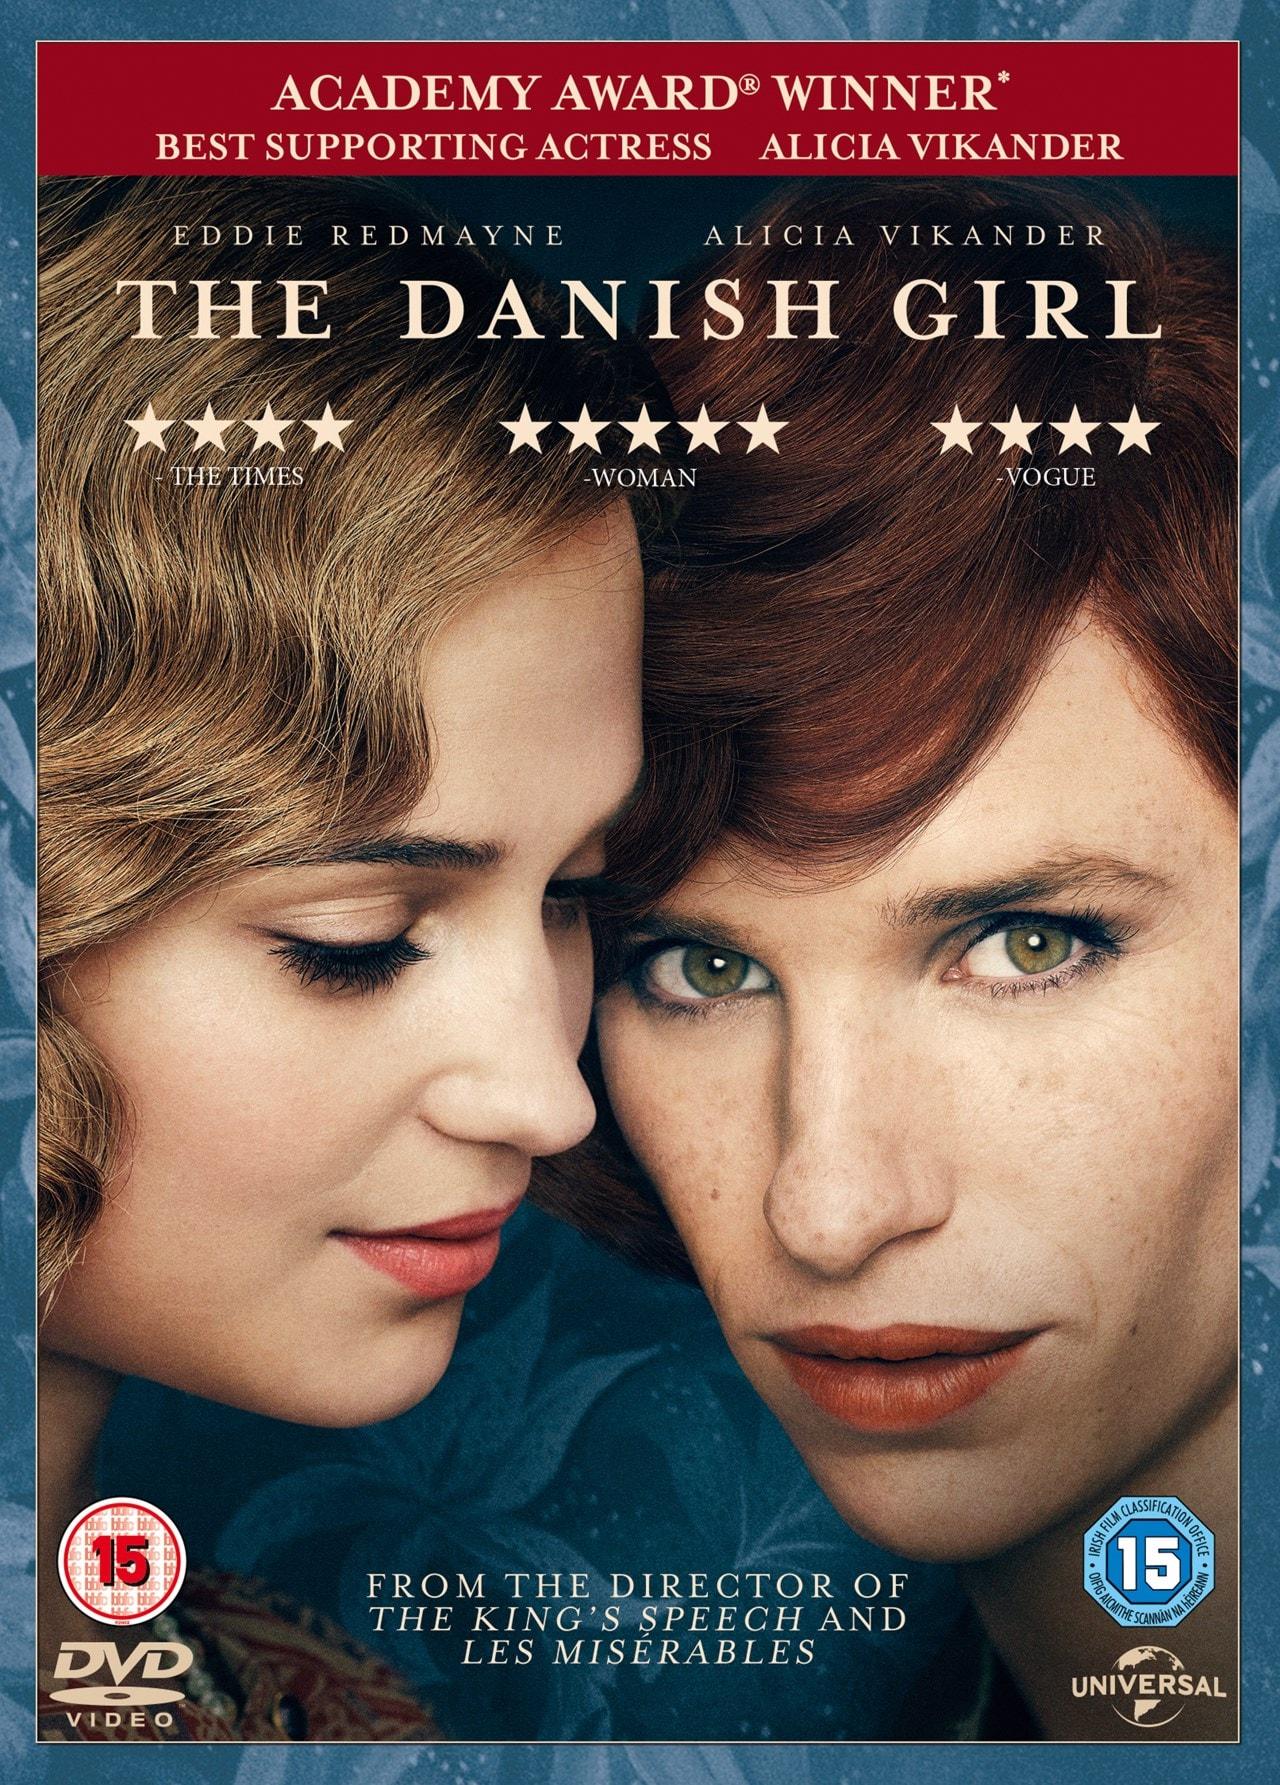 The Danish Girl - 1